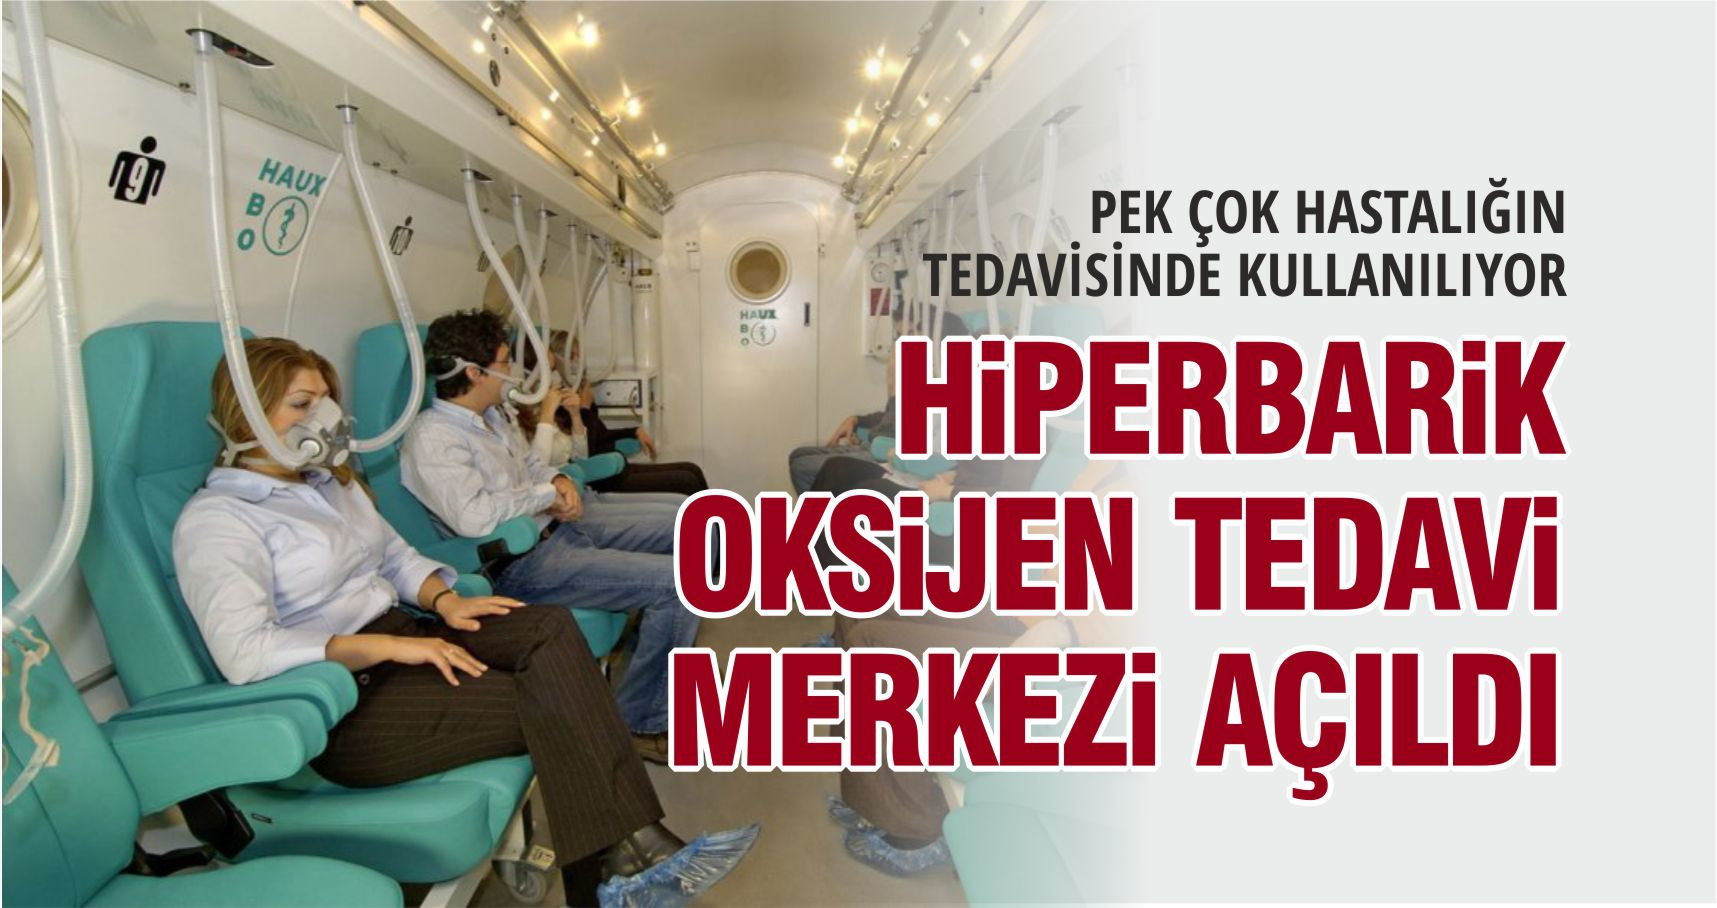 BALIKESİR'E HİPERBARİK OKSİJEN MERKEZİ